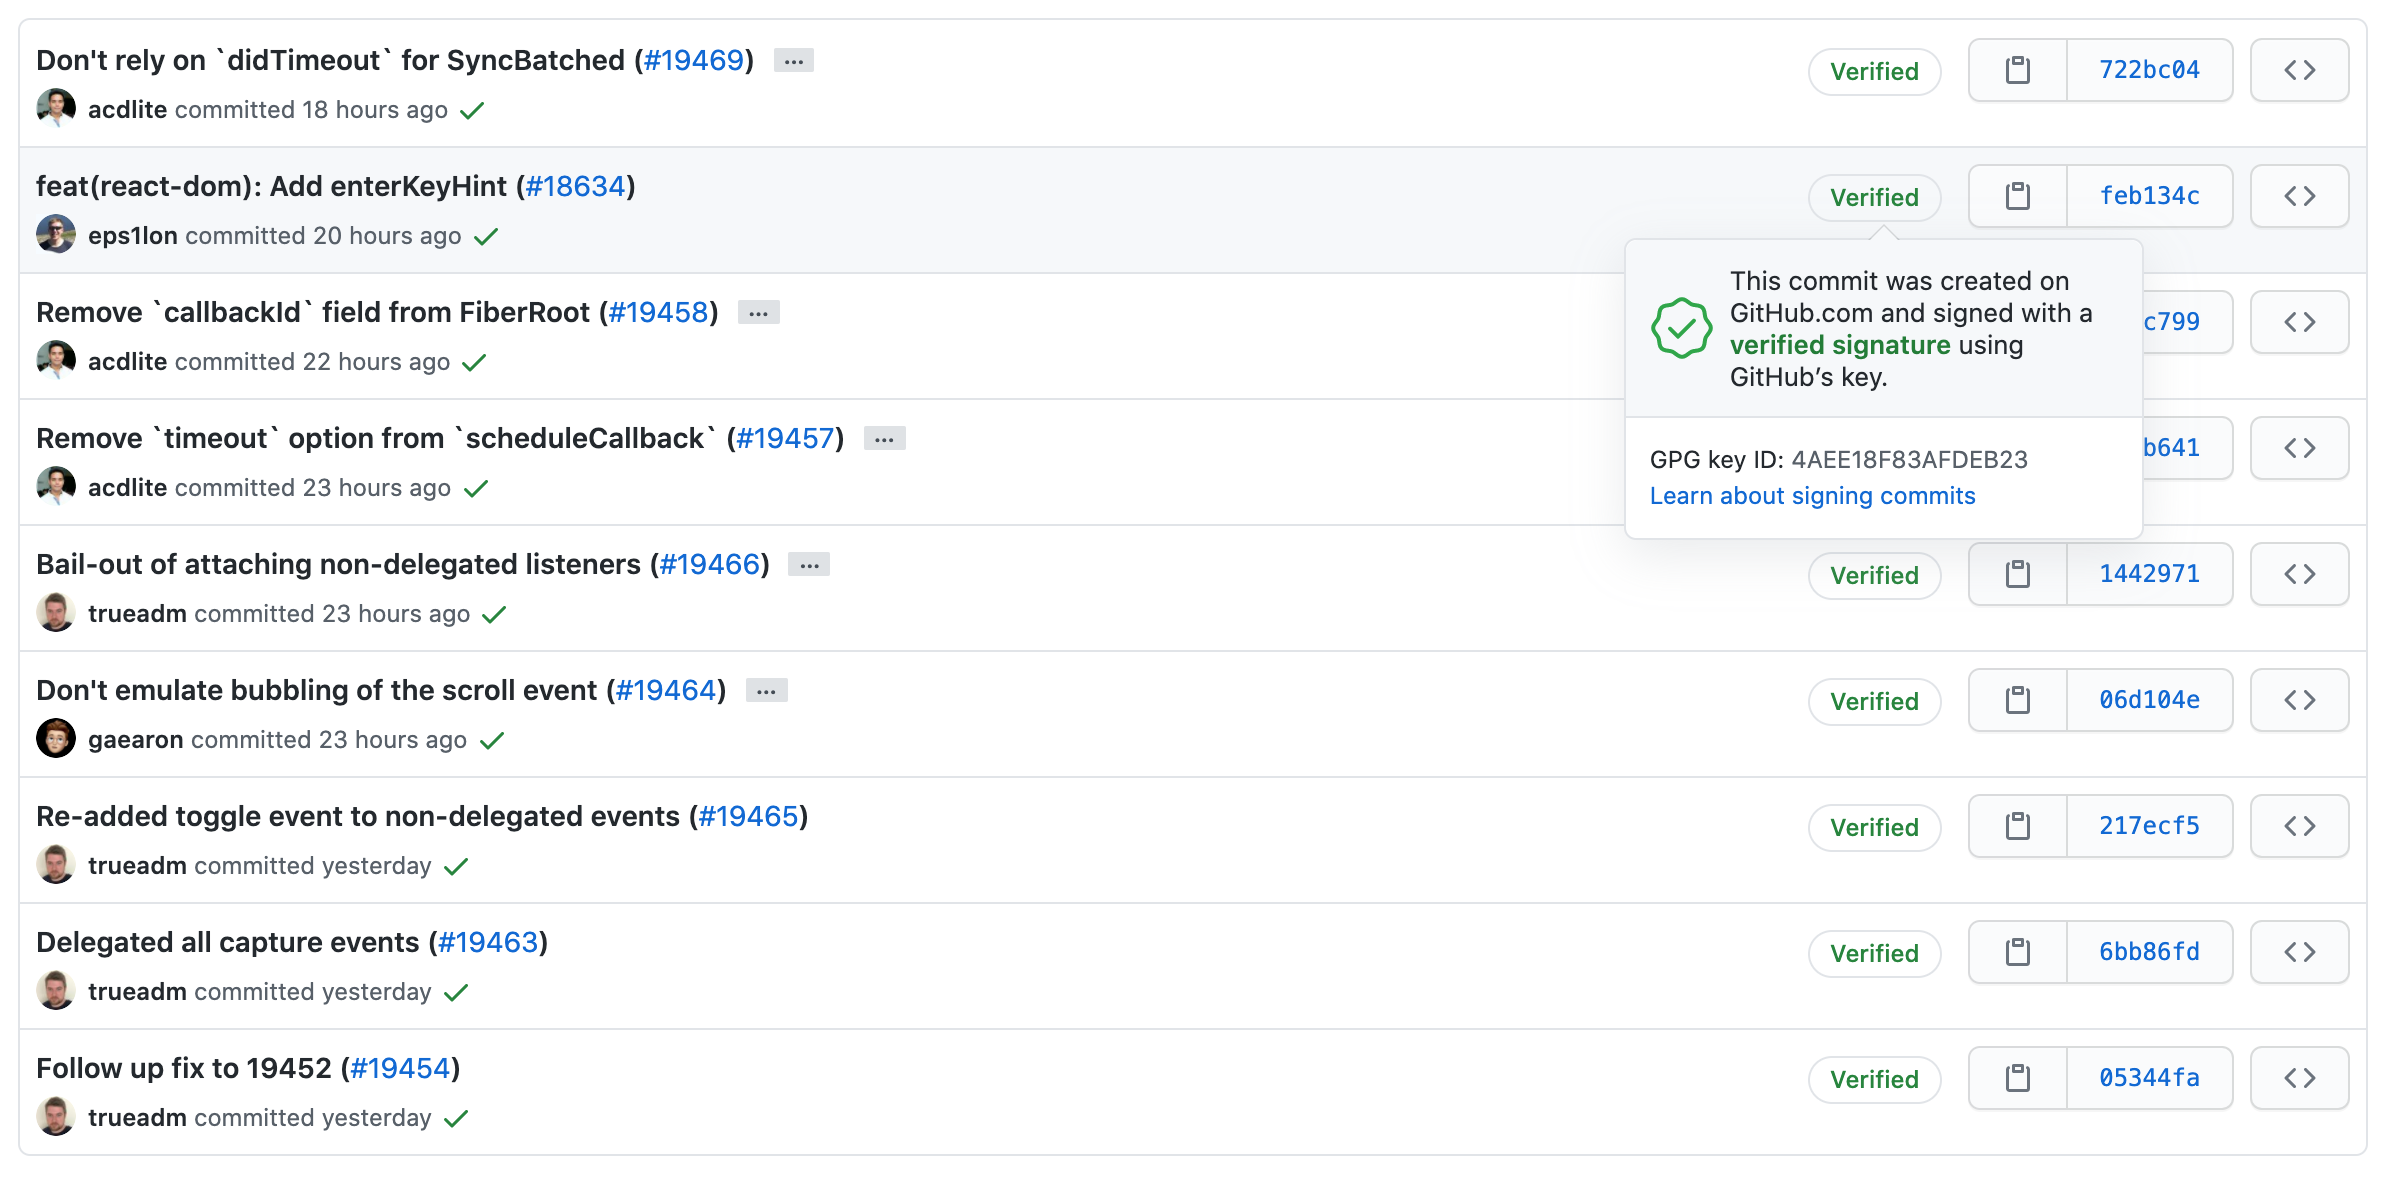 GPG verified commits on GitHub